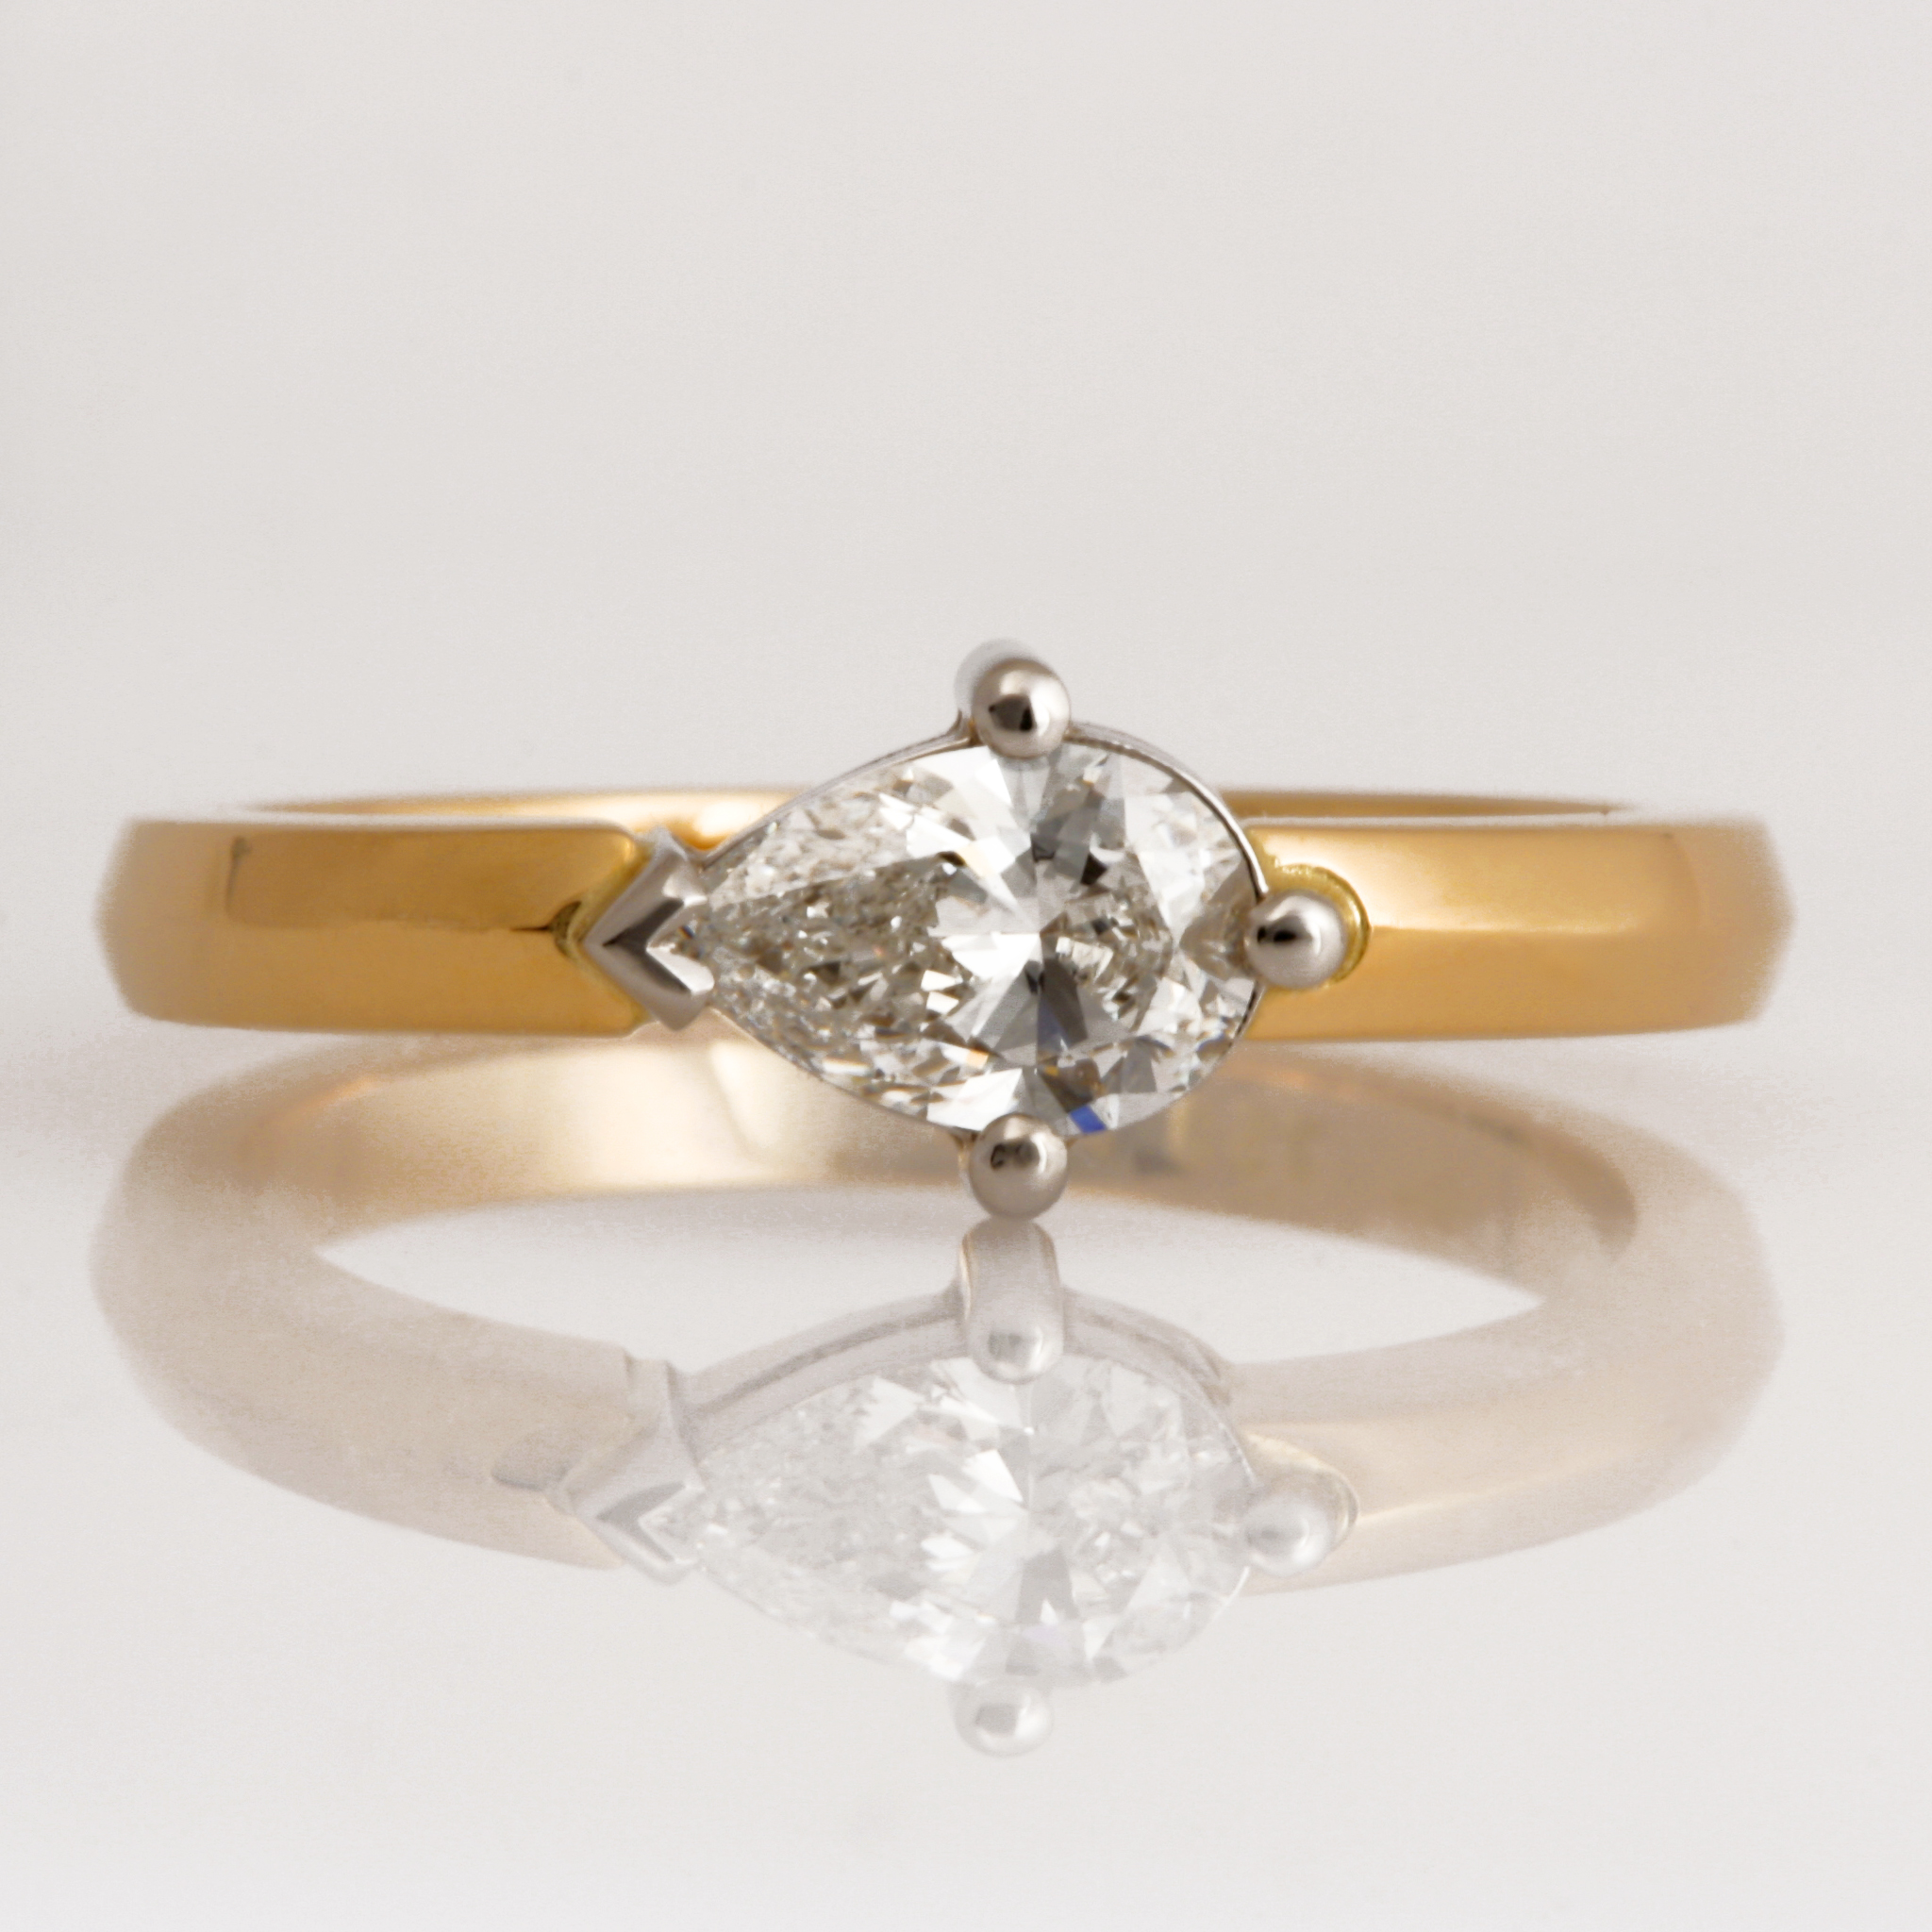 Handmade ladies 18ct yellow gold and platinum pear shape diamond engagement ring